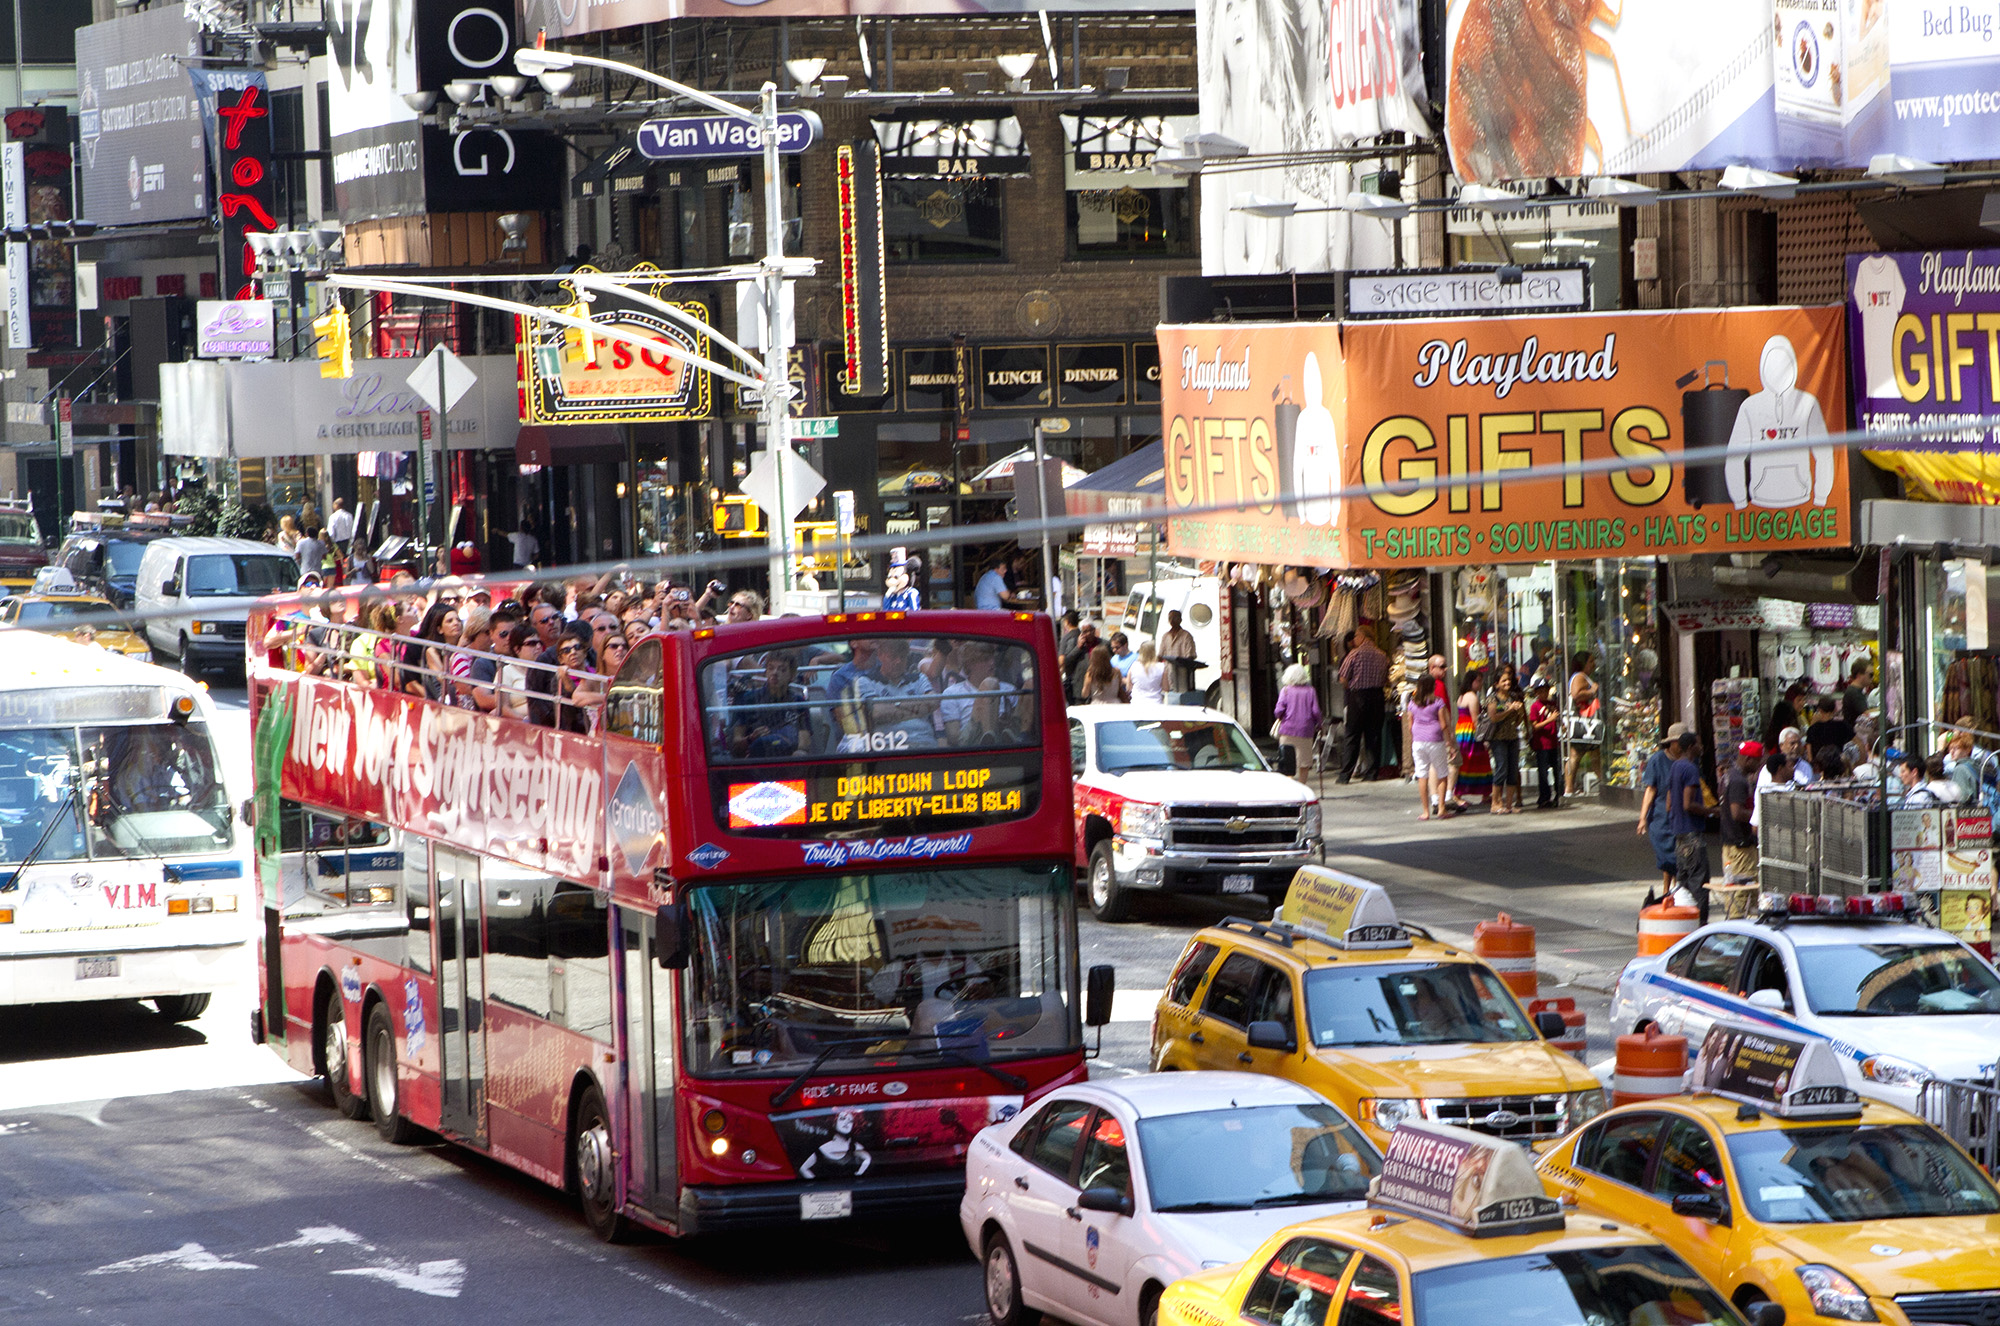 NYC Sightseeing | New York Sightseeing